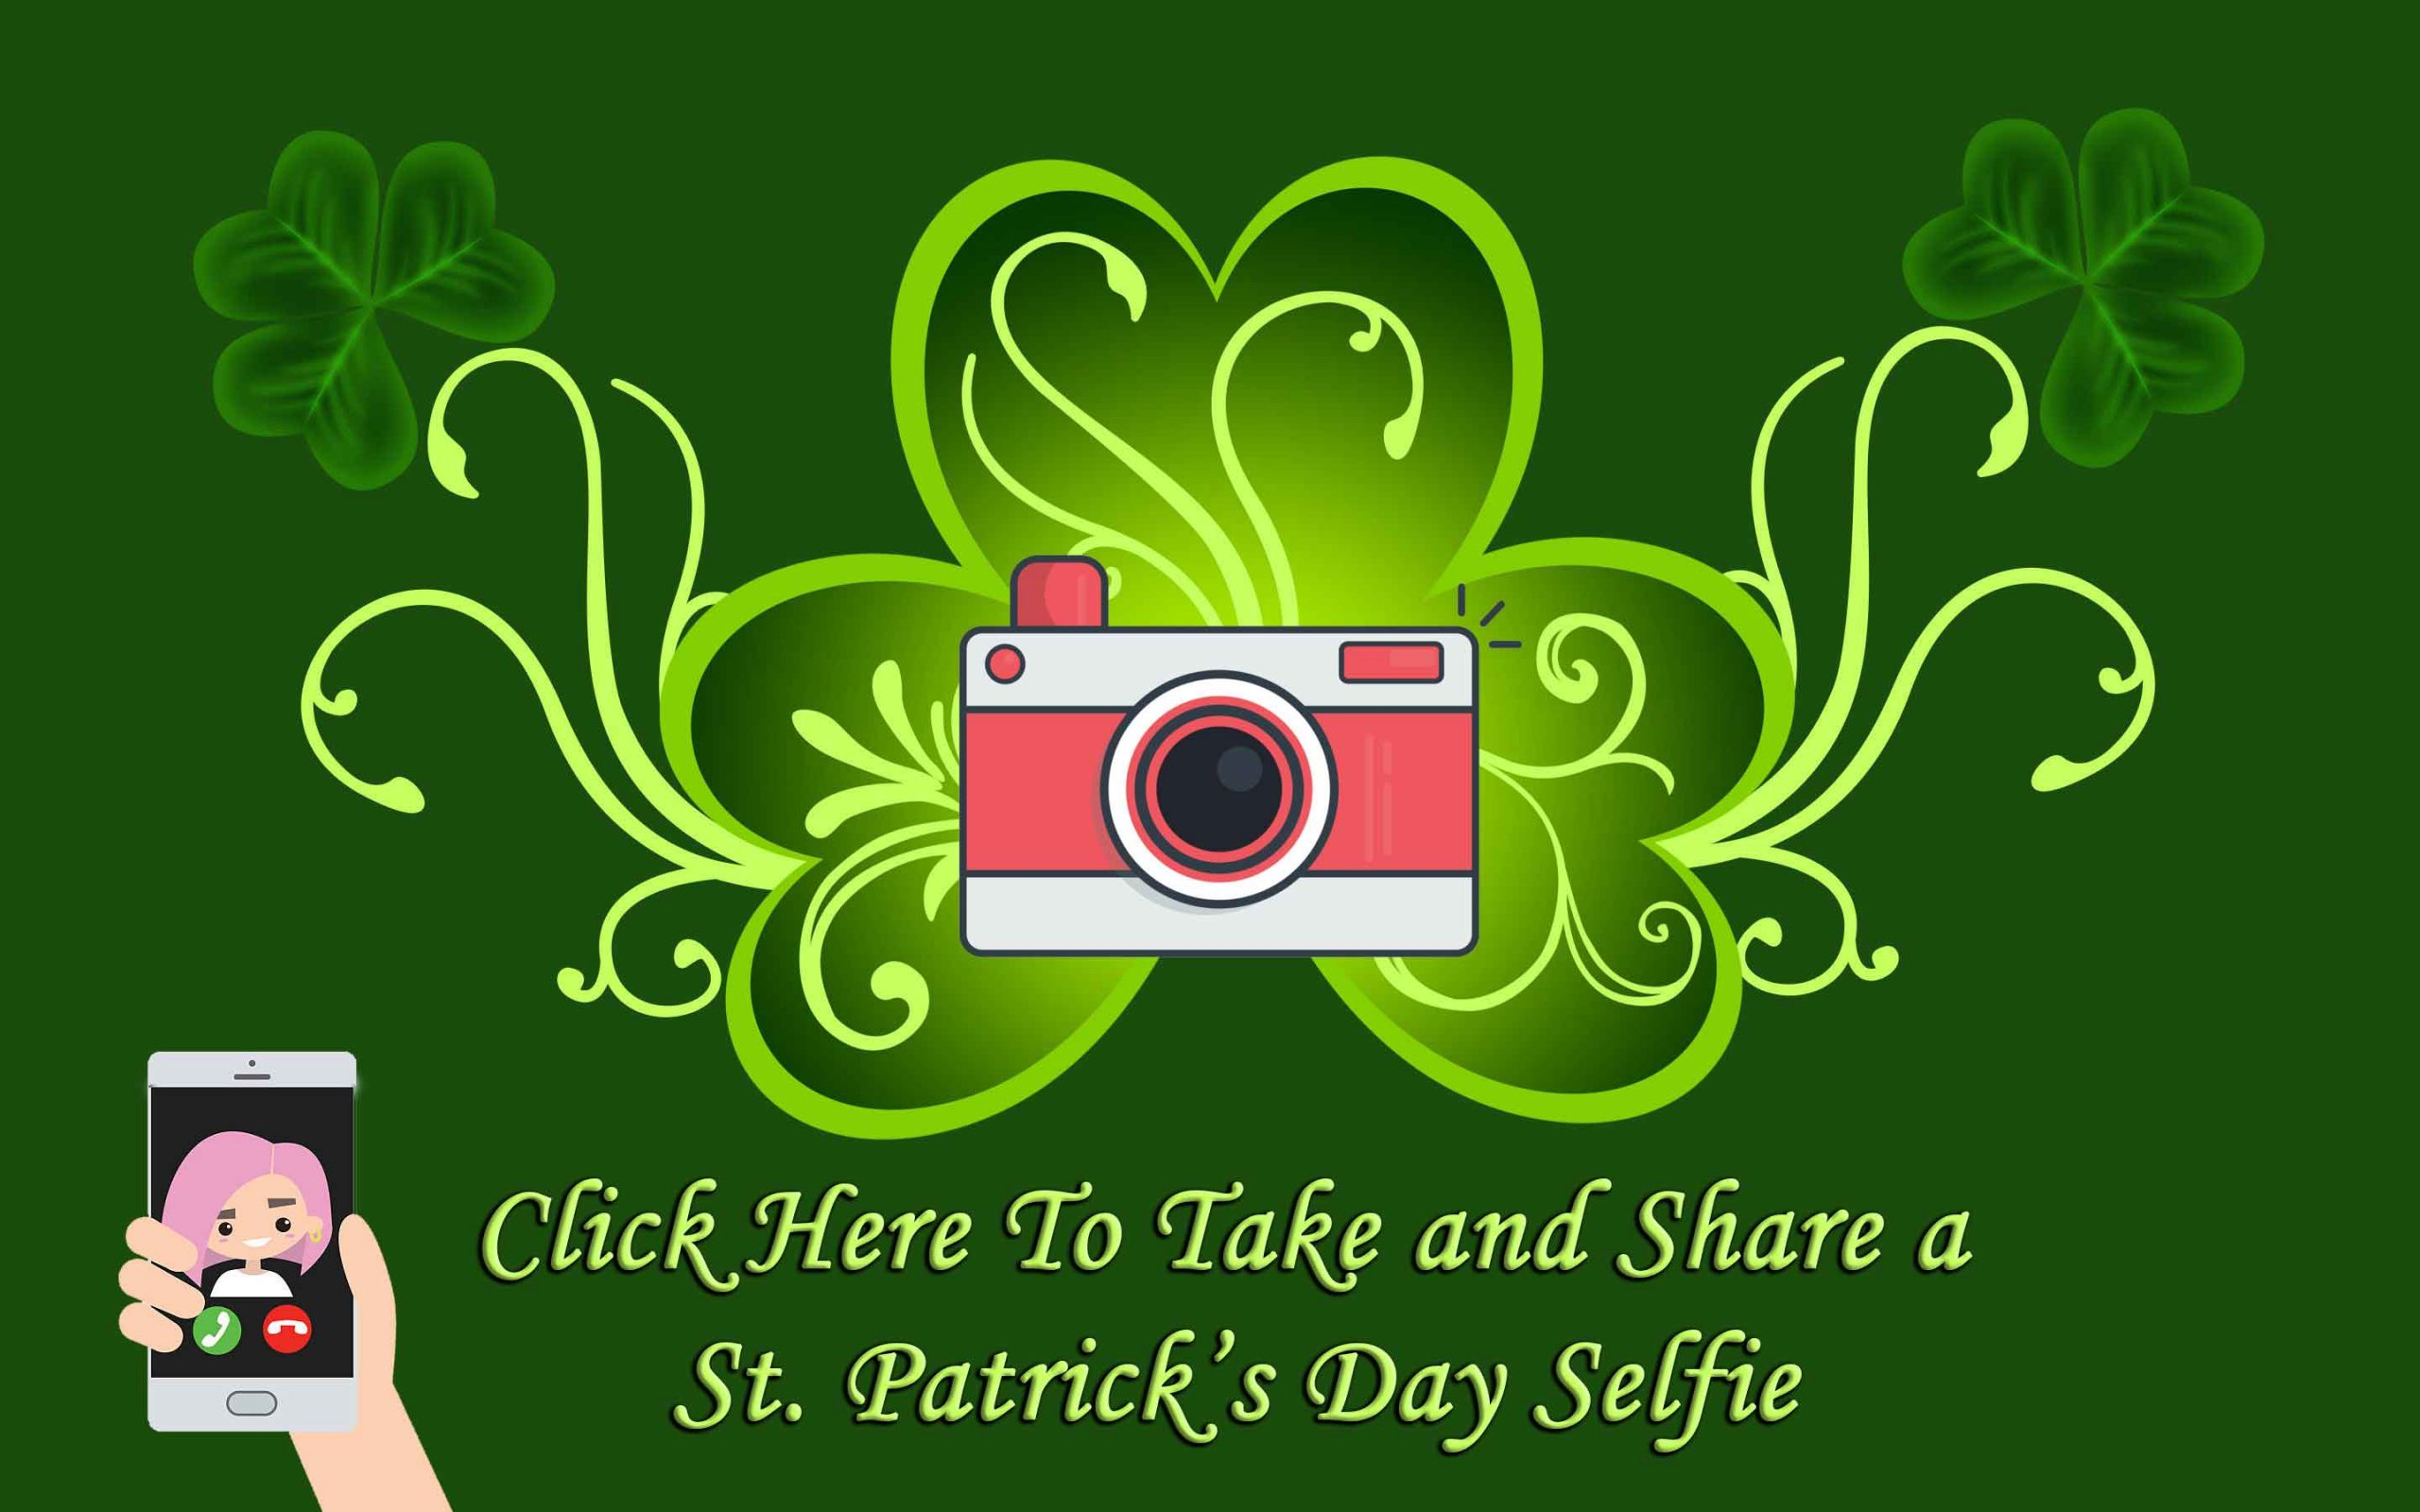 St. Patrick's Day Selfie